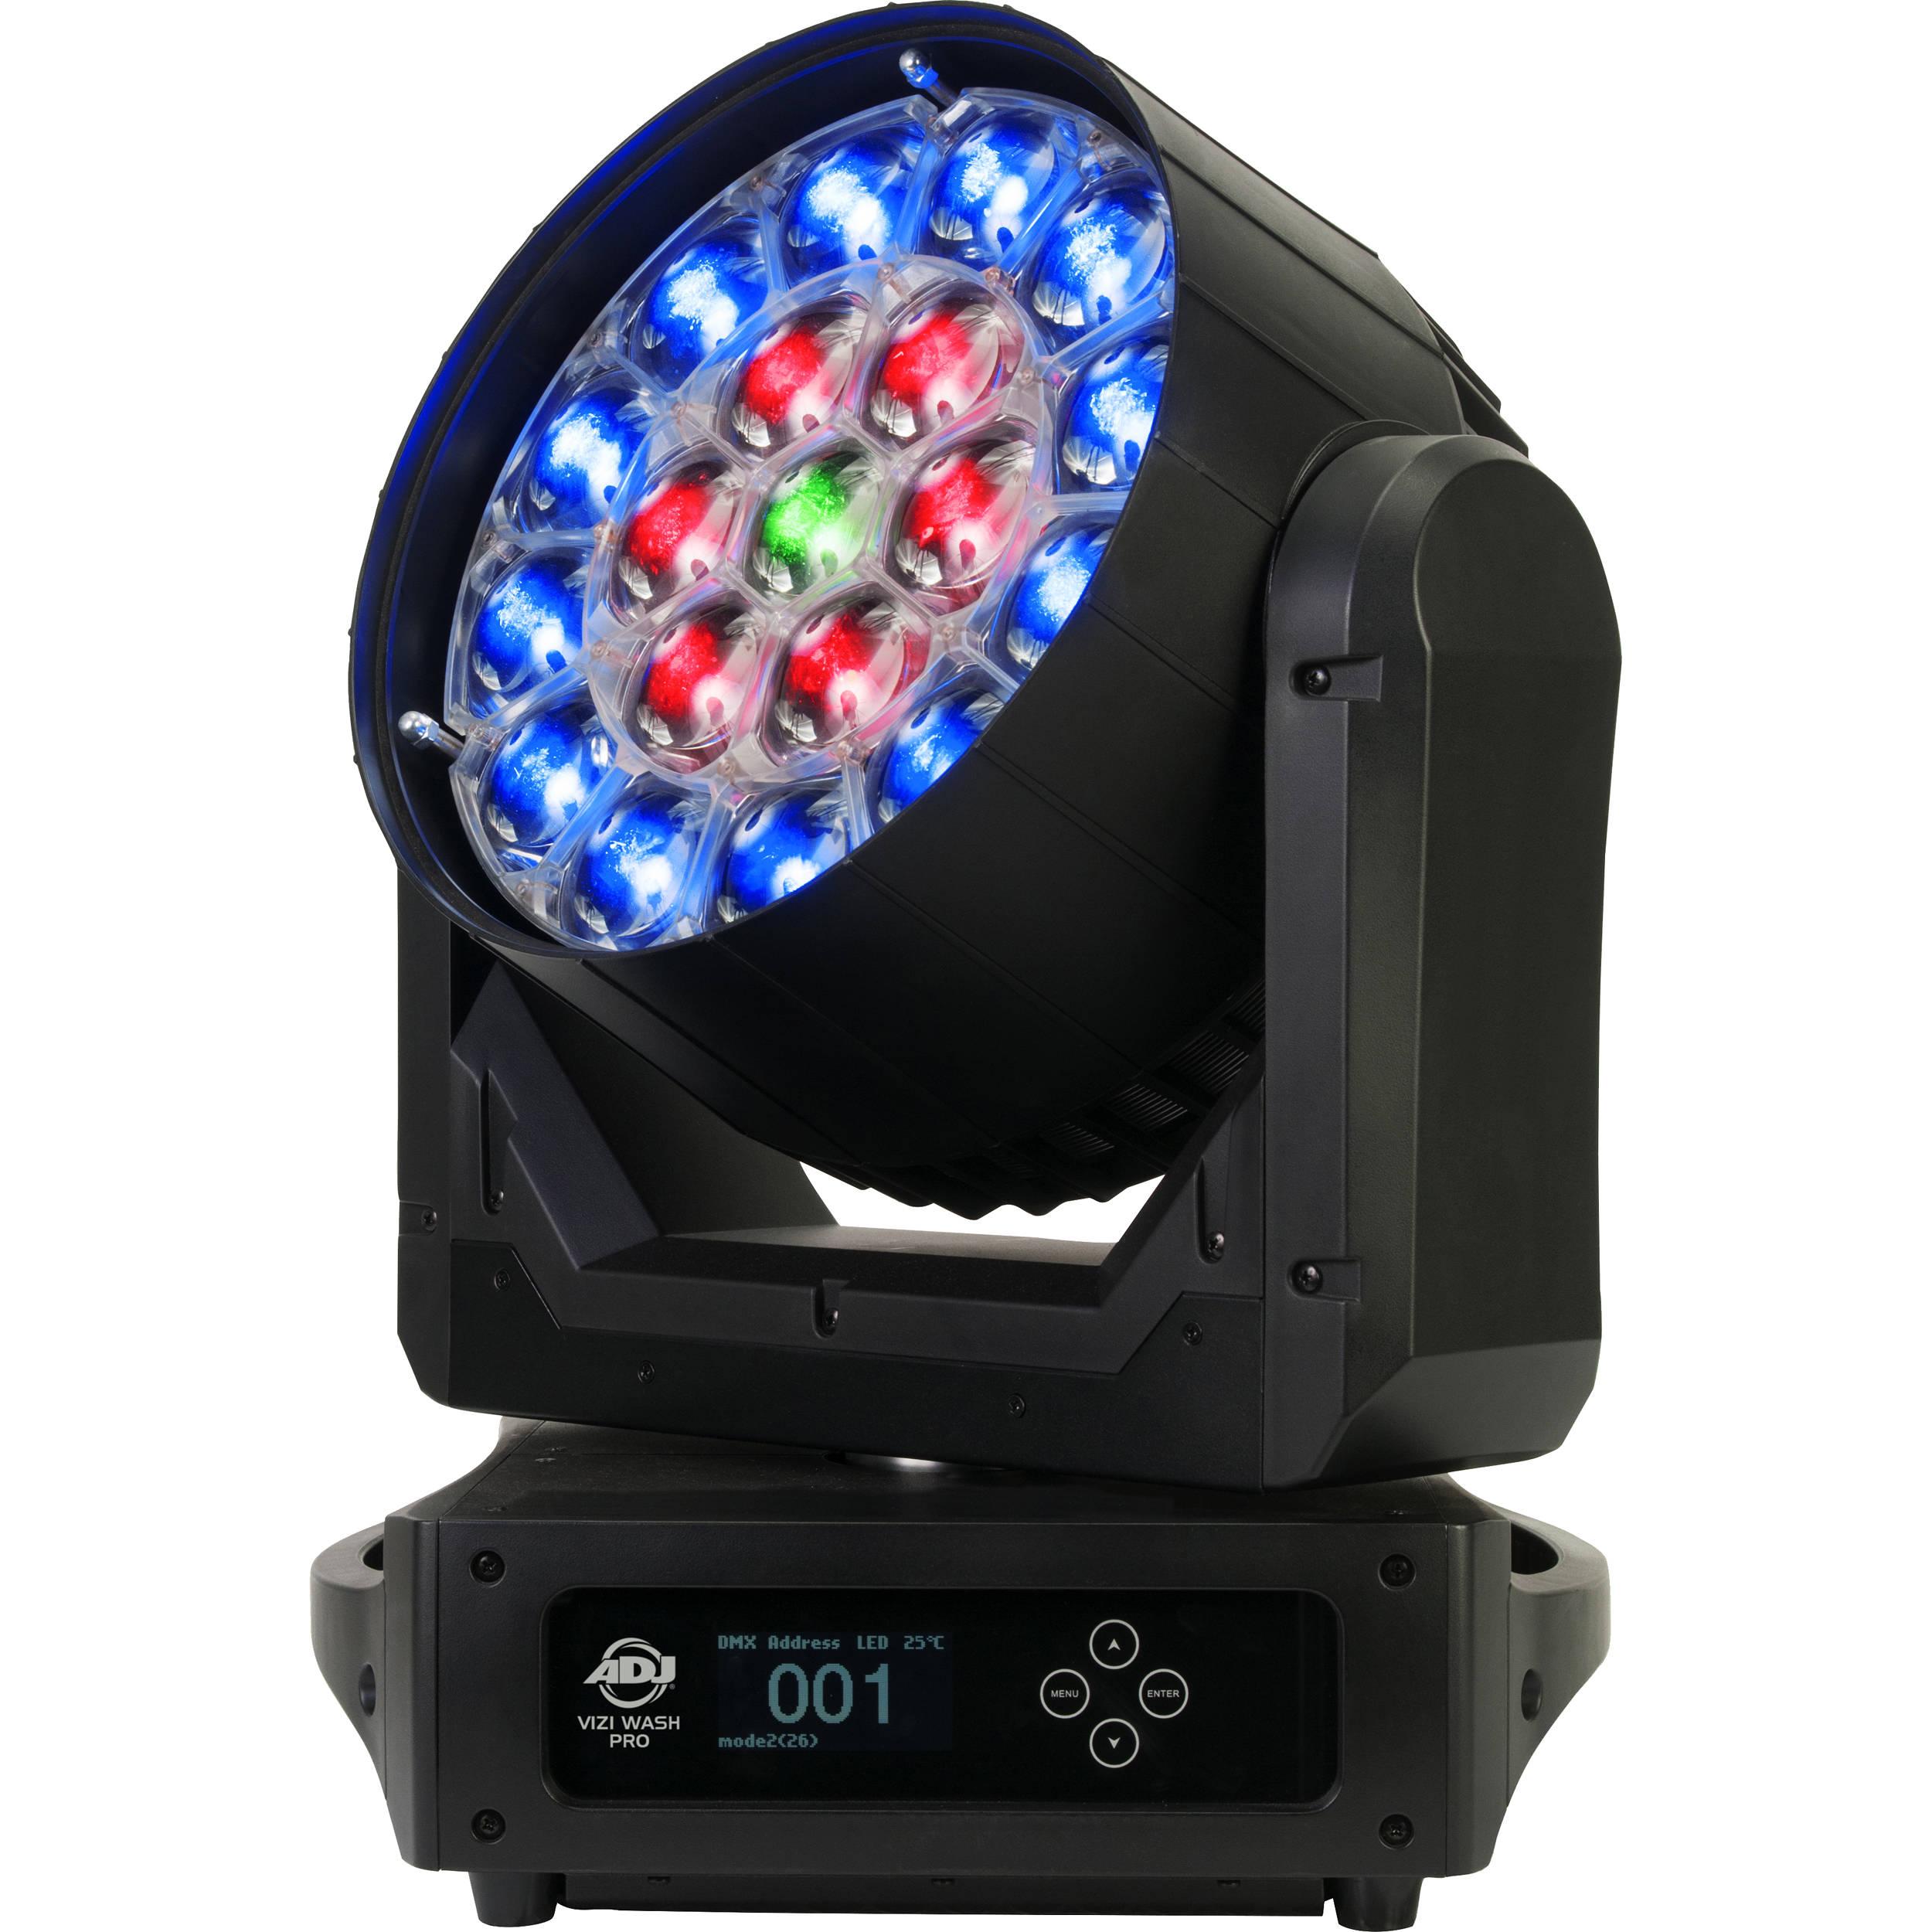 american dj vizi wash pro 570w rgbw led wash light vizi wash pro